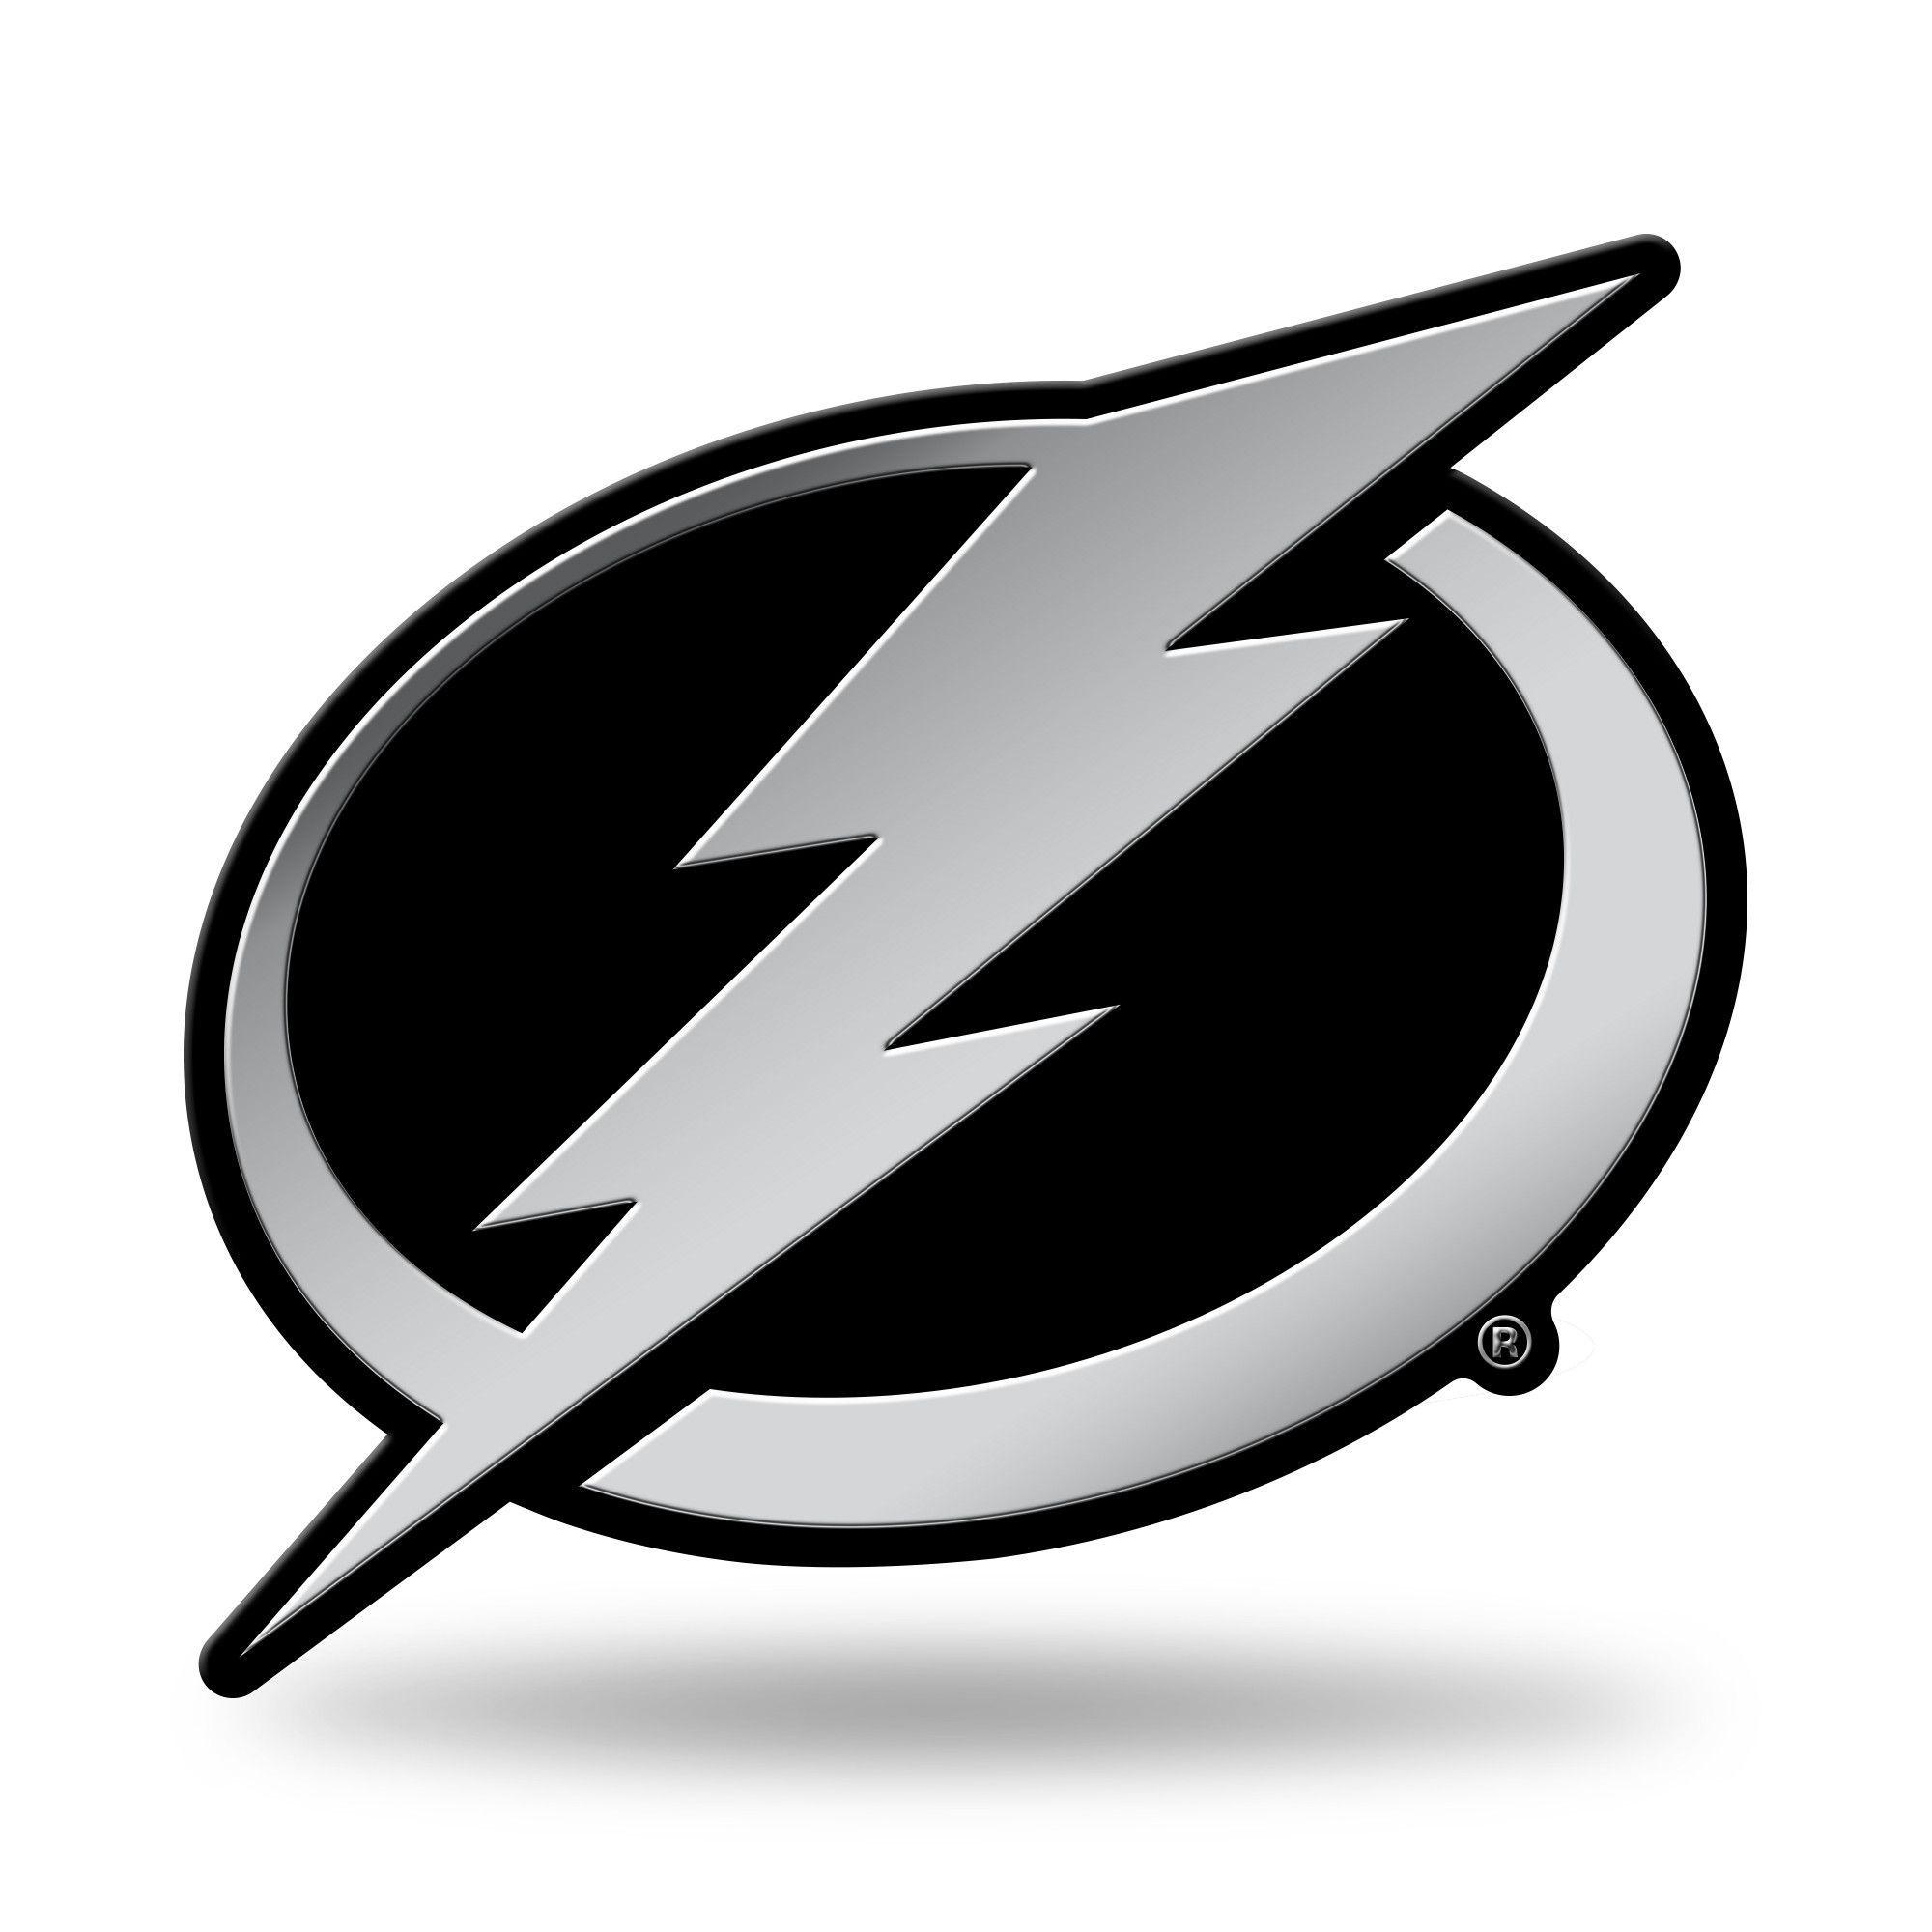 Tampa Bay Lightning Logo 3d Chrome Auto Emblem New Truck Or Car Rico Nhl Car Emblem Tampa Bay Lightning Logo Emblems